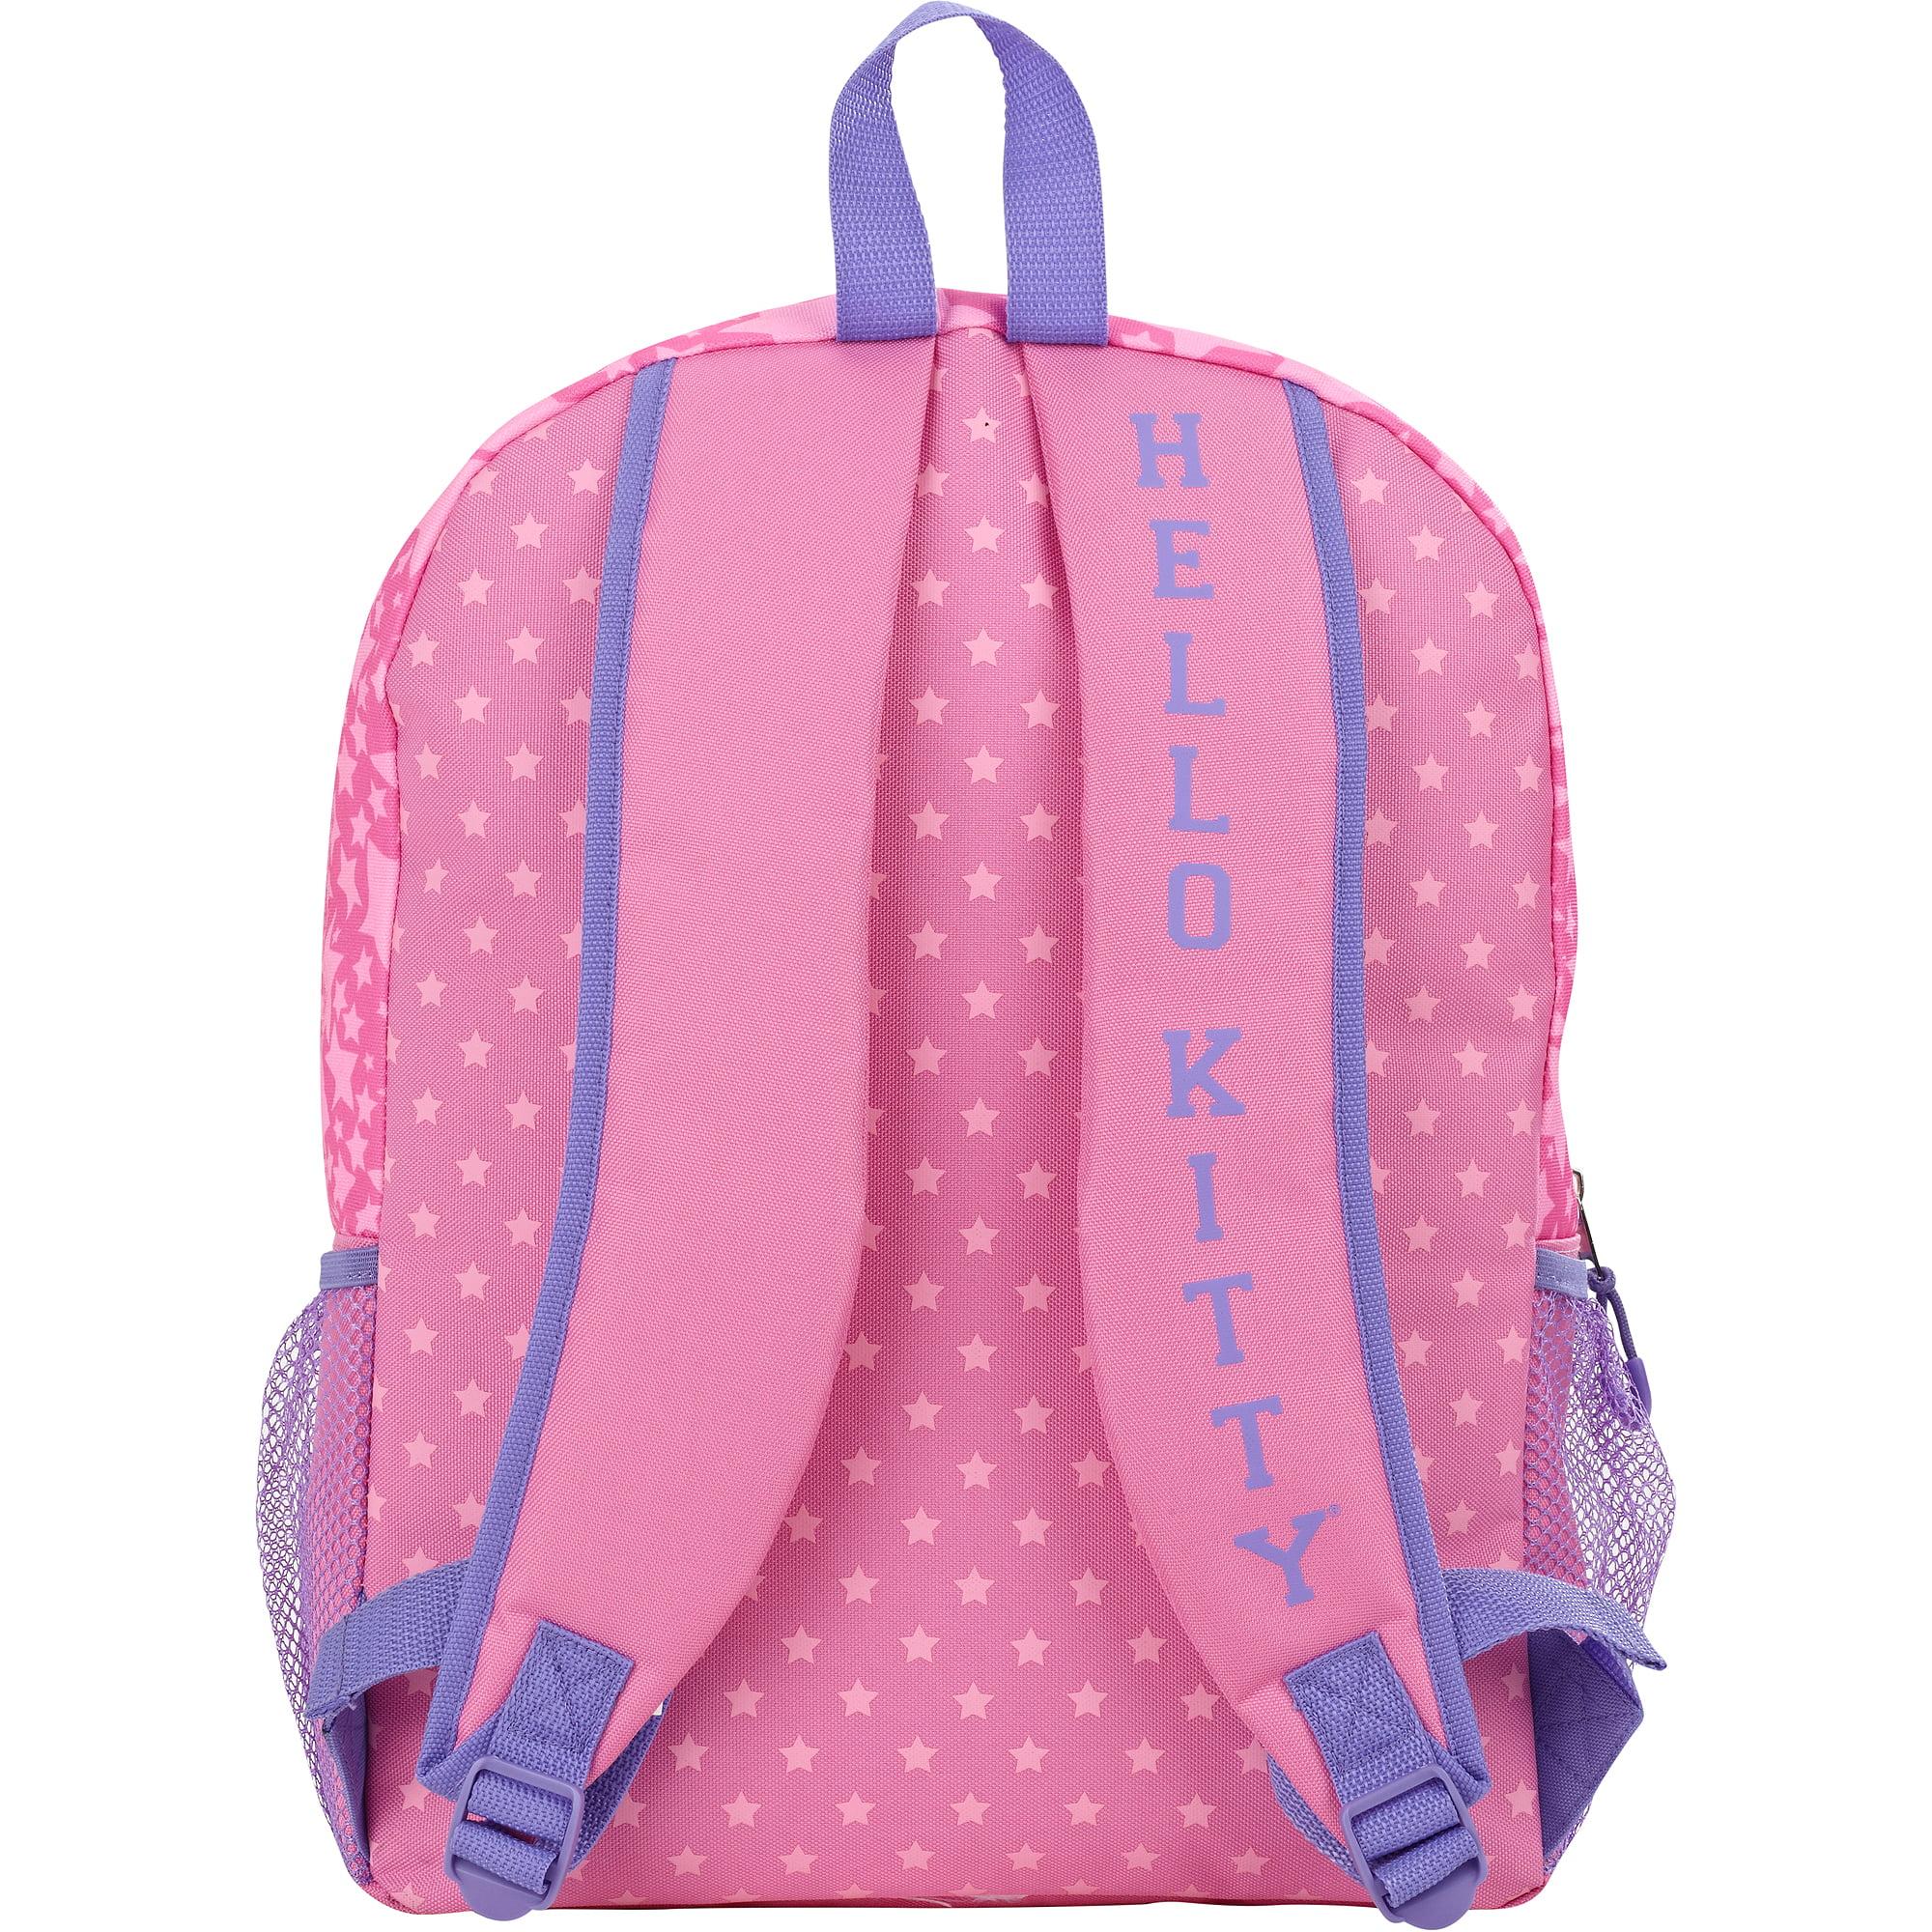 "Hello Kitty Pink Star Cheerleader 16"" Backpack"